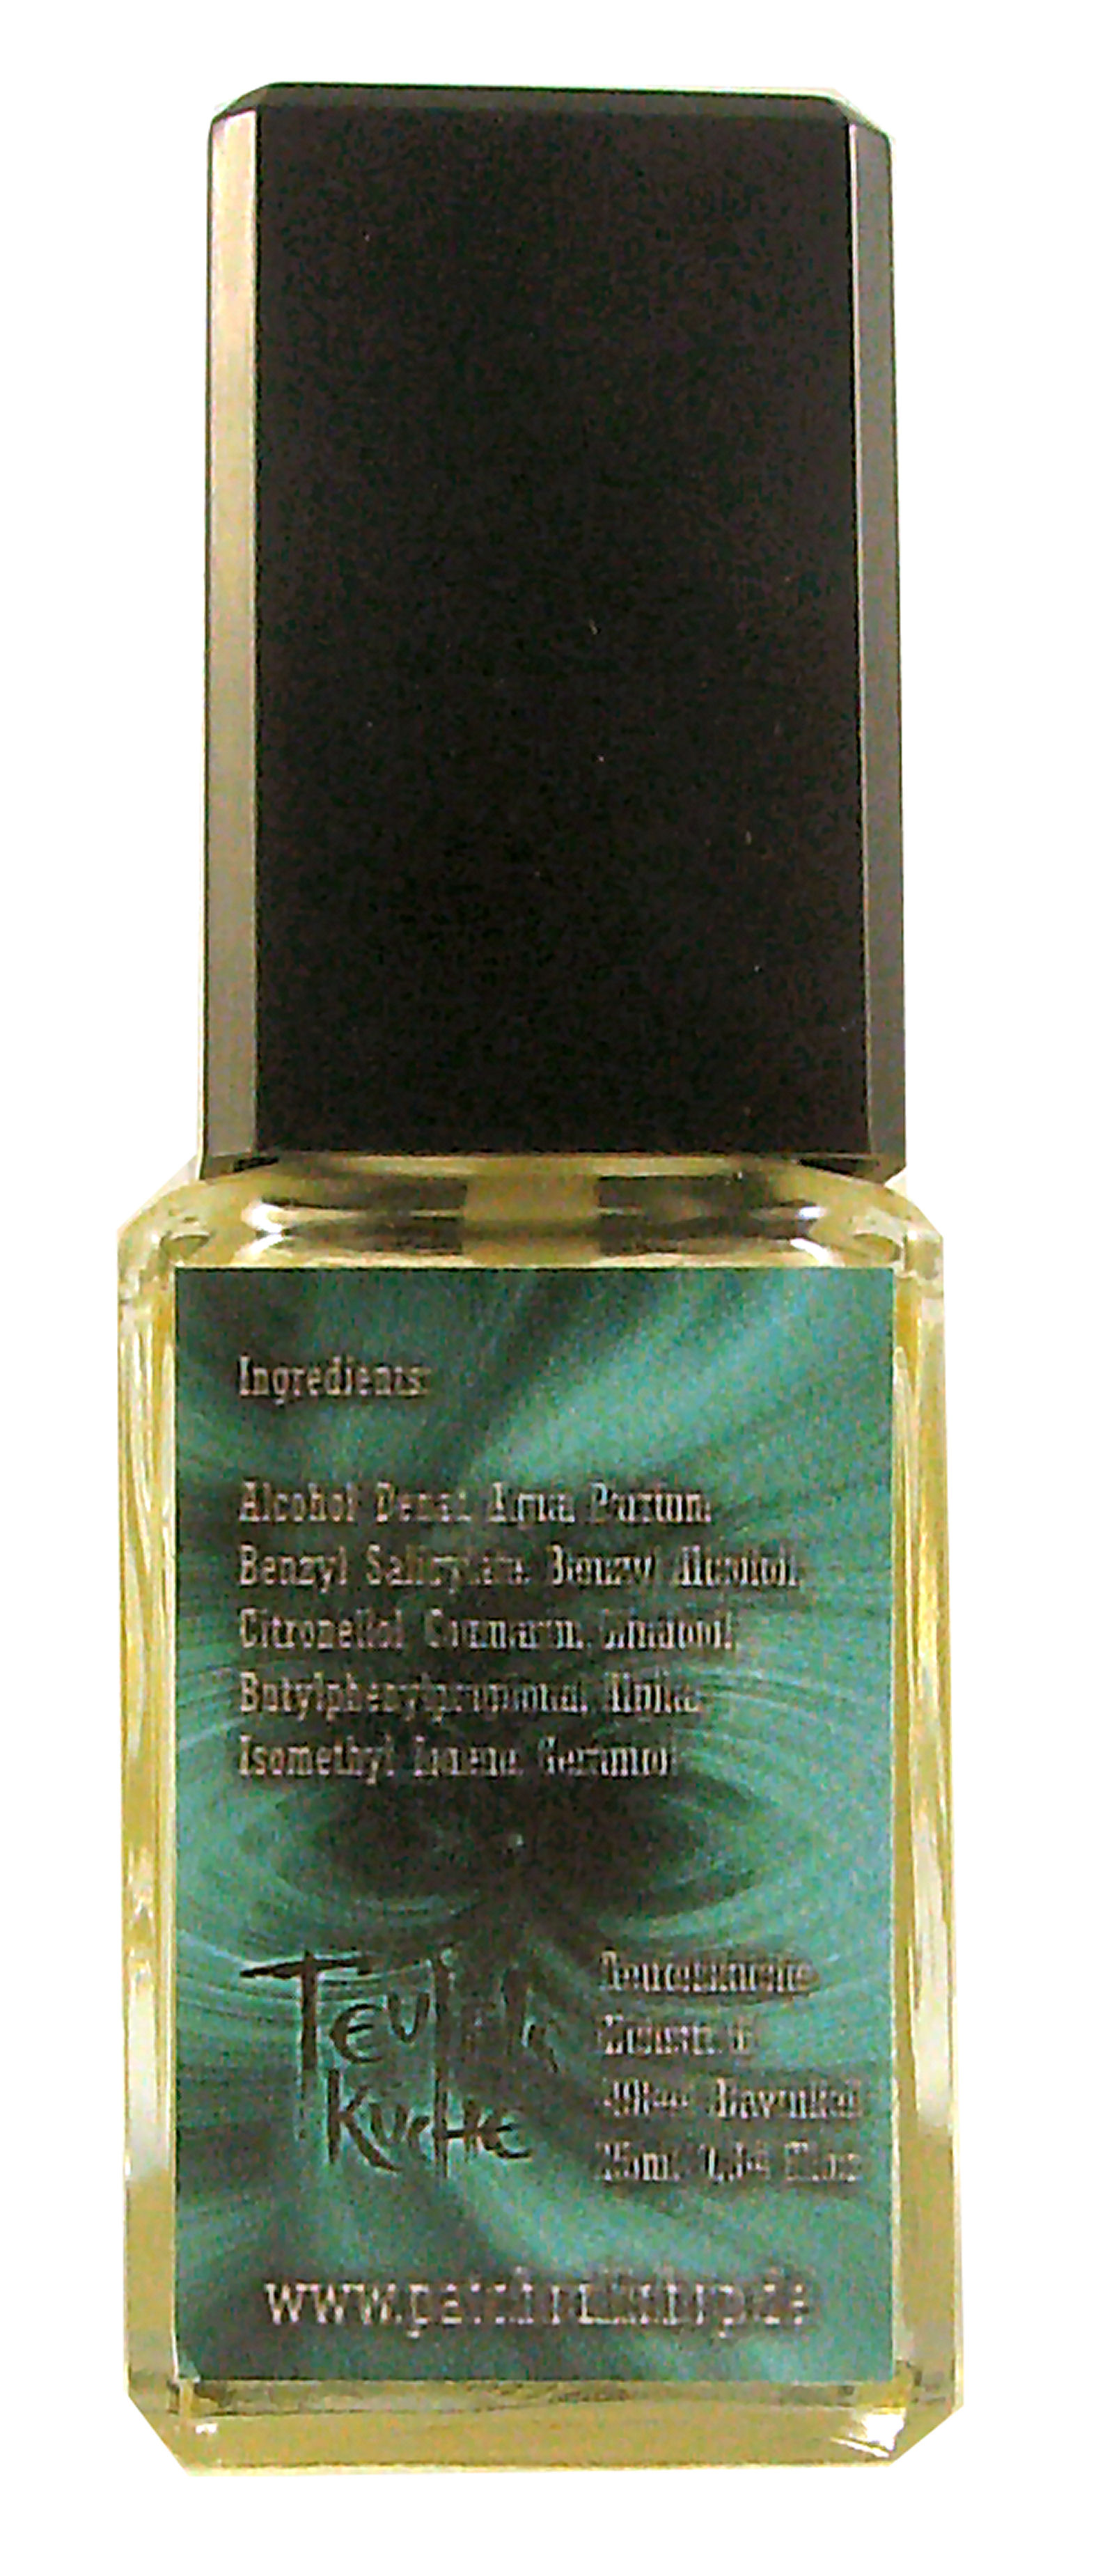 Greedy, 25ml Eau de Parfum